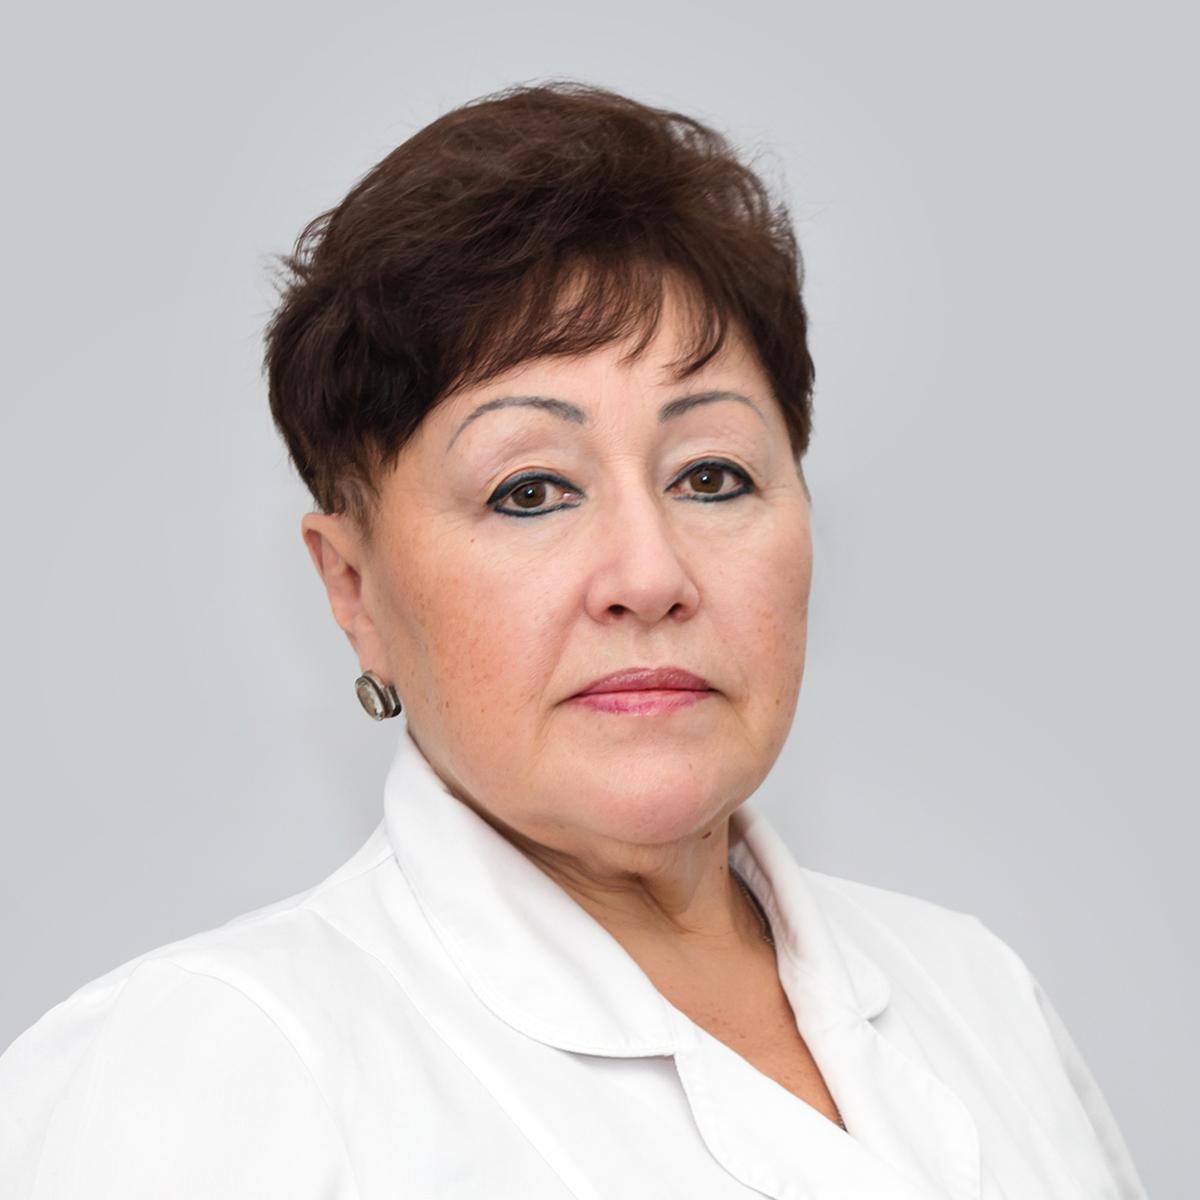 Сиренко Людмила Николаевна